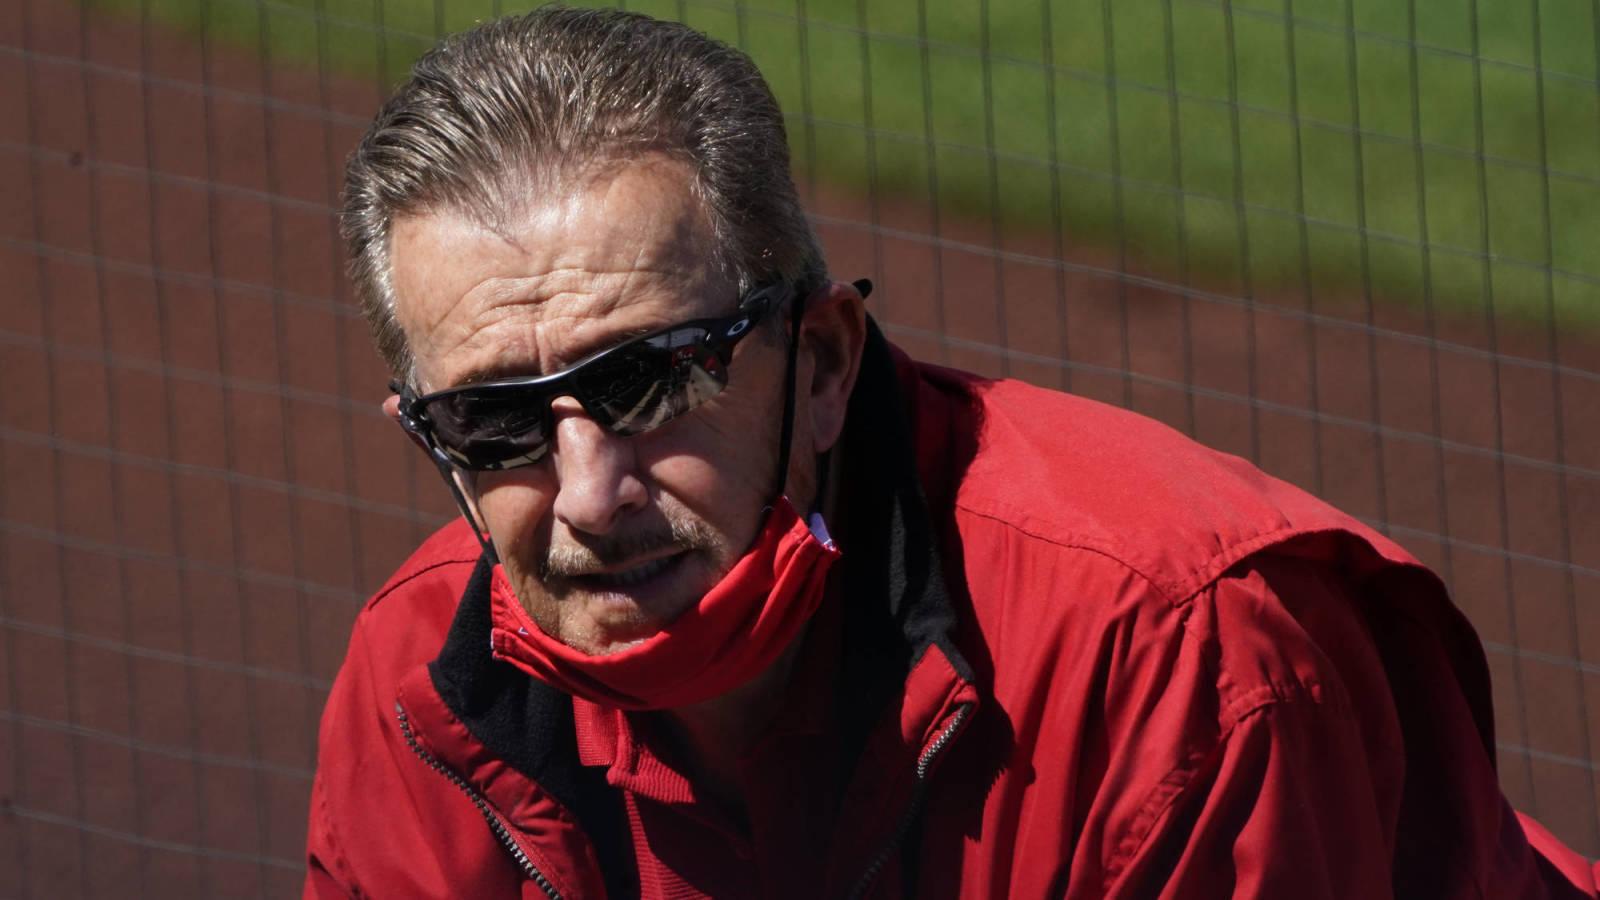 Angels minor league players allege mistreatment